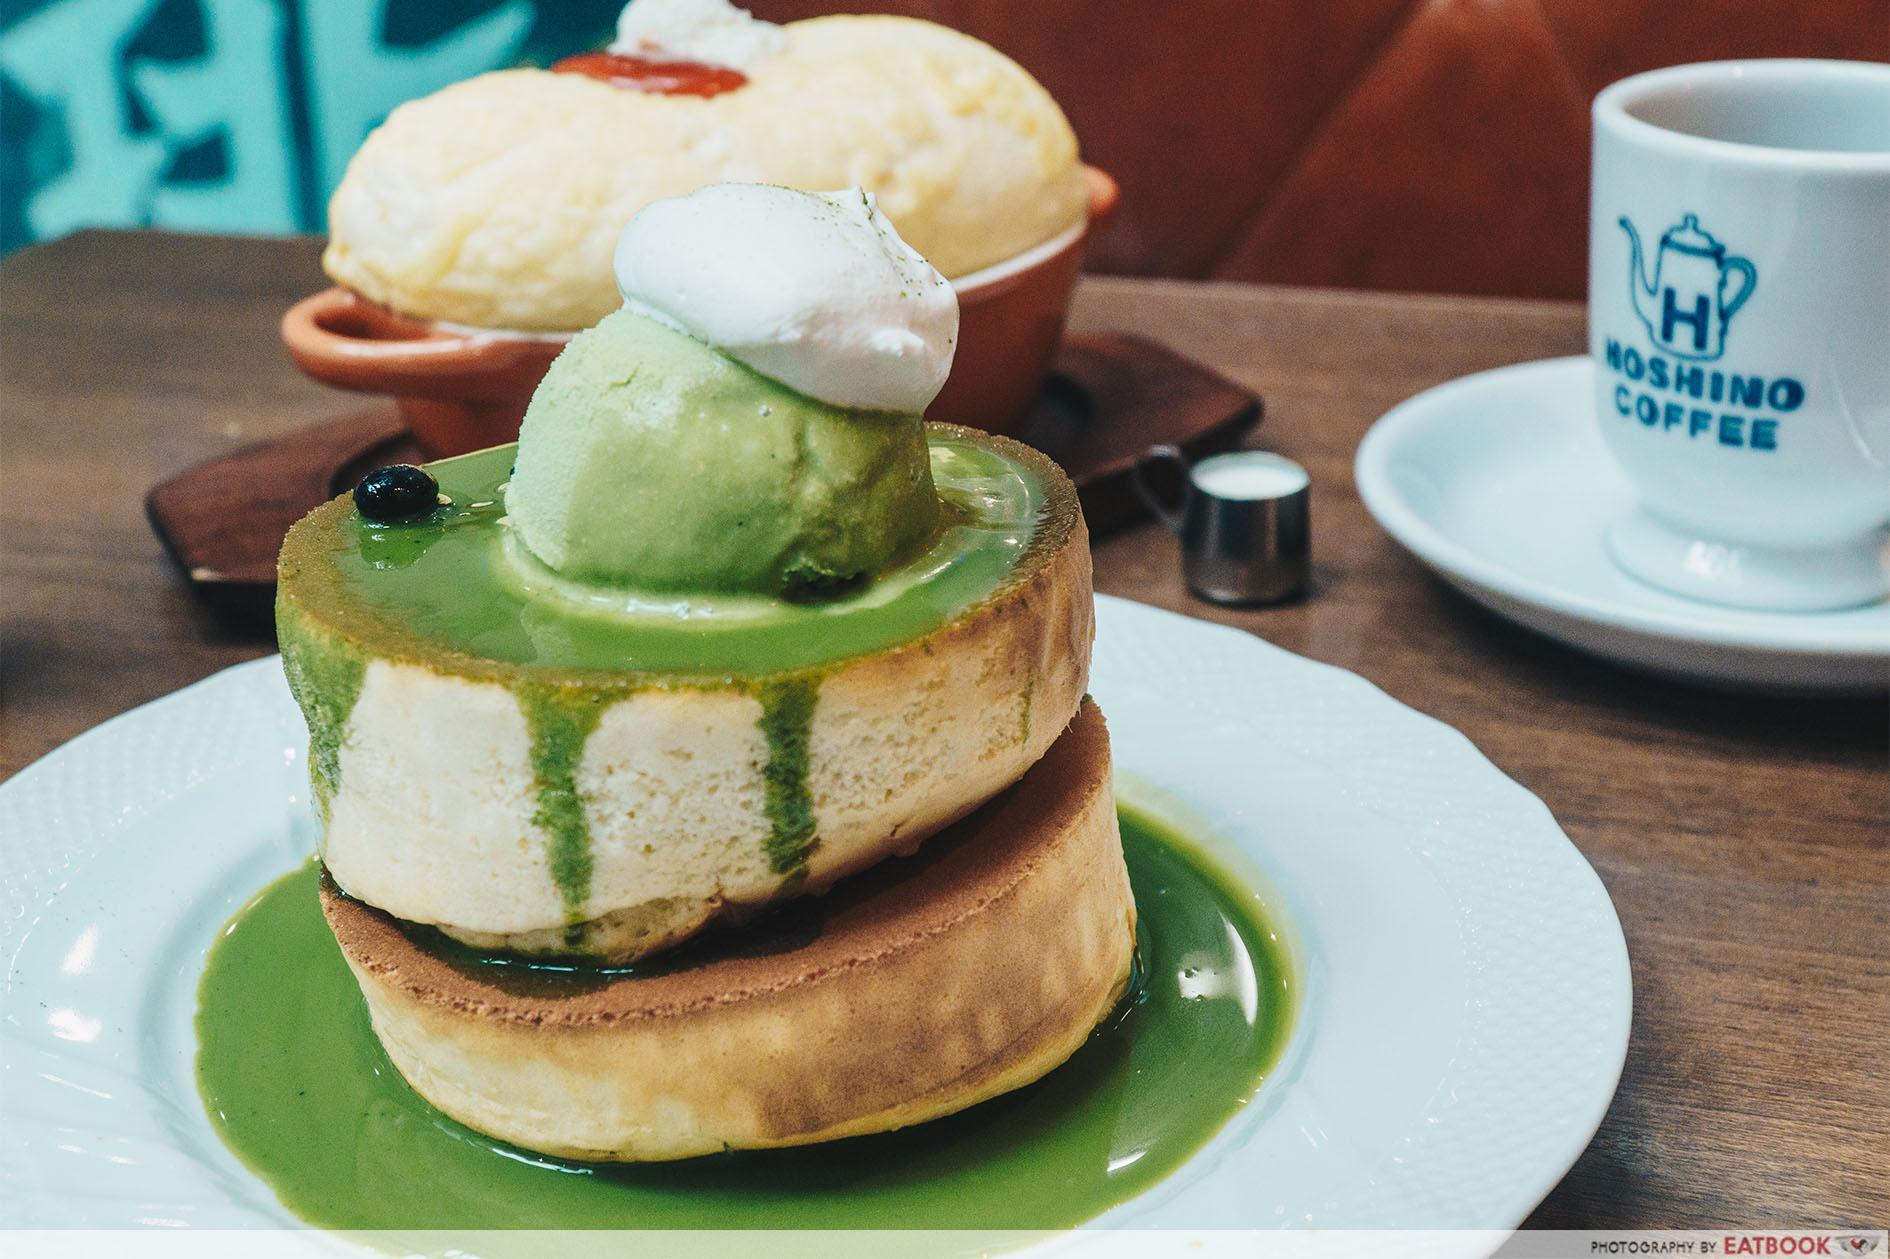 Chope Dessert Delivery - Hoshino Coffee